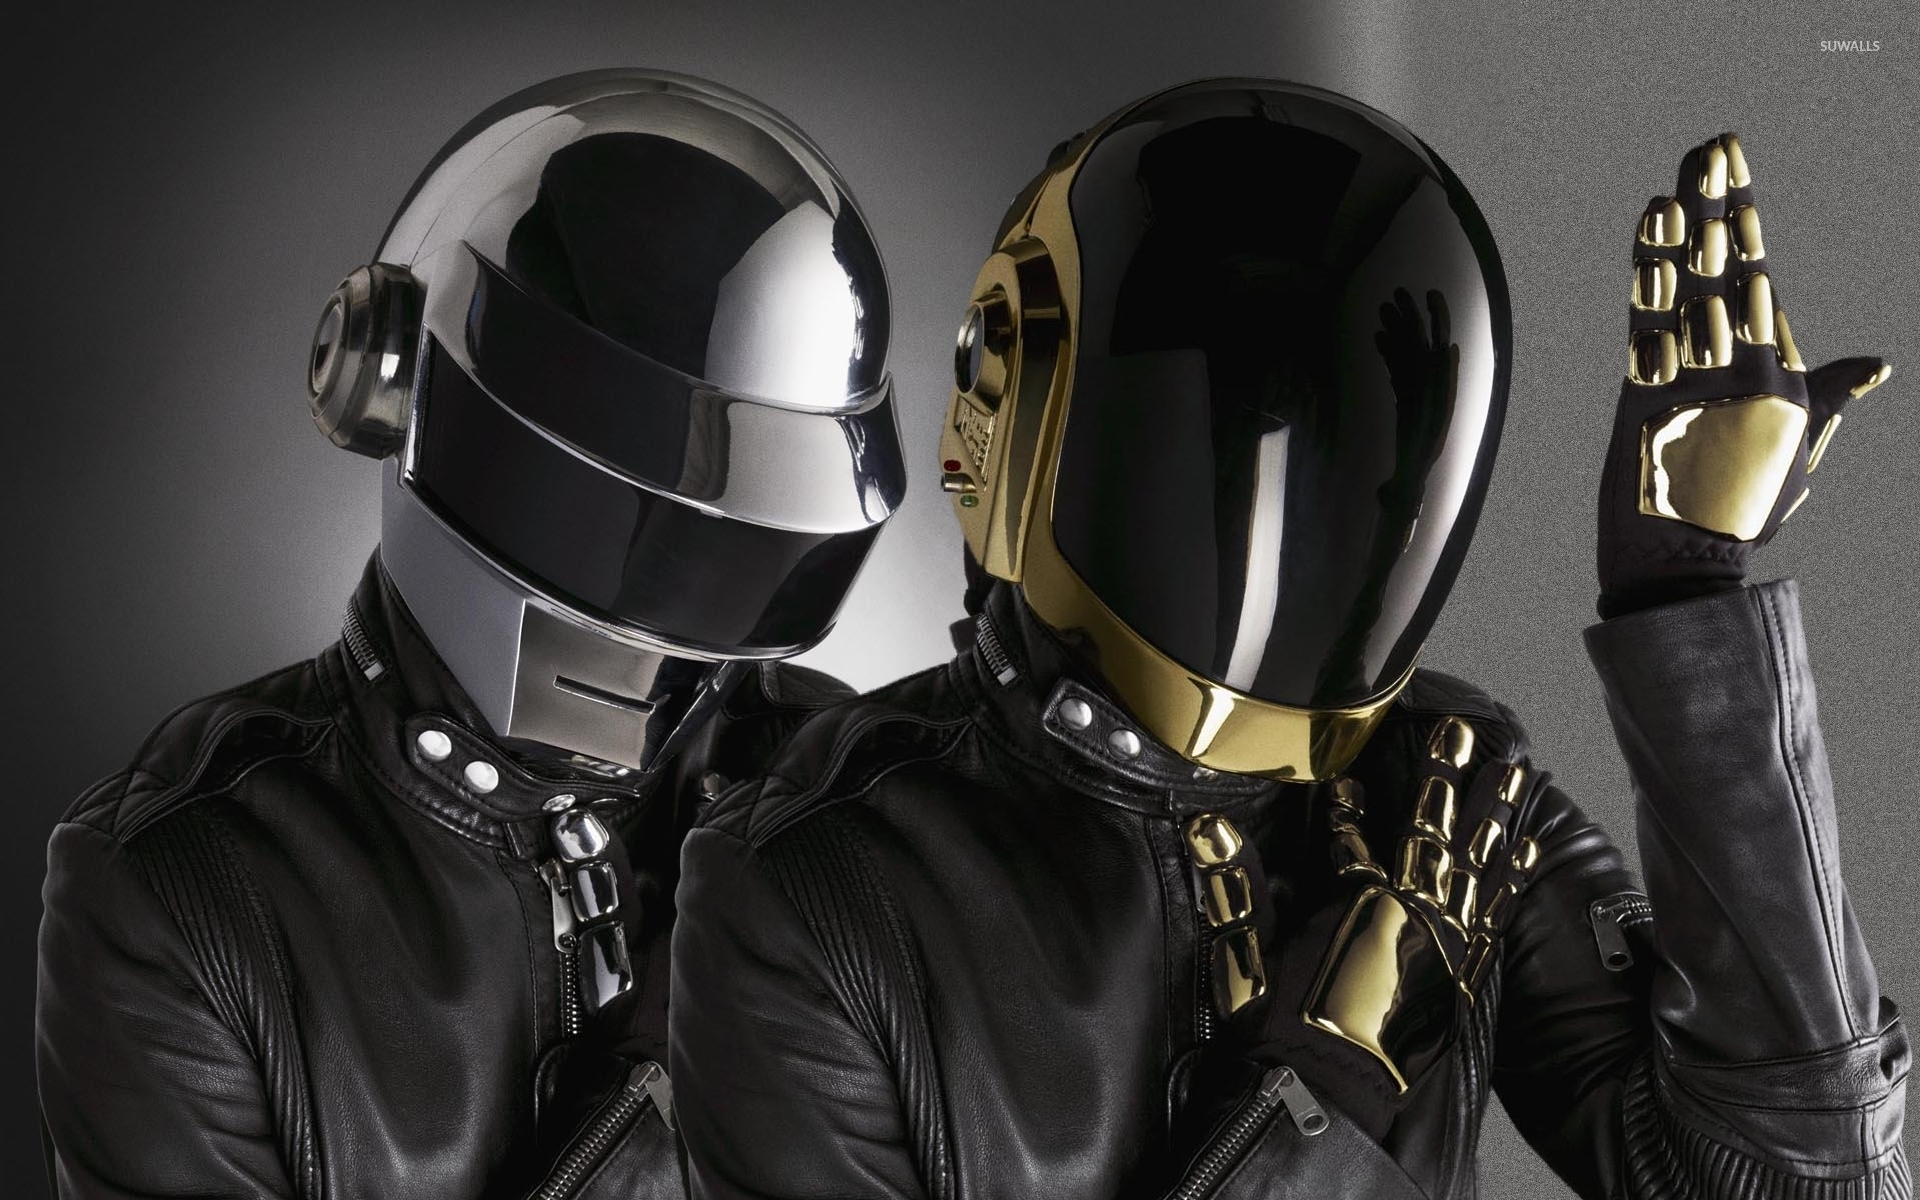 Daft Punk 11 wallpaper - Music wallpapers - #30539